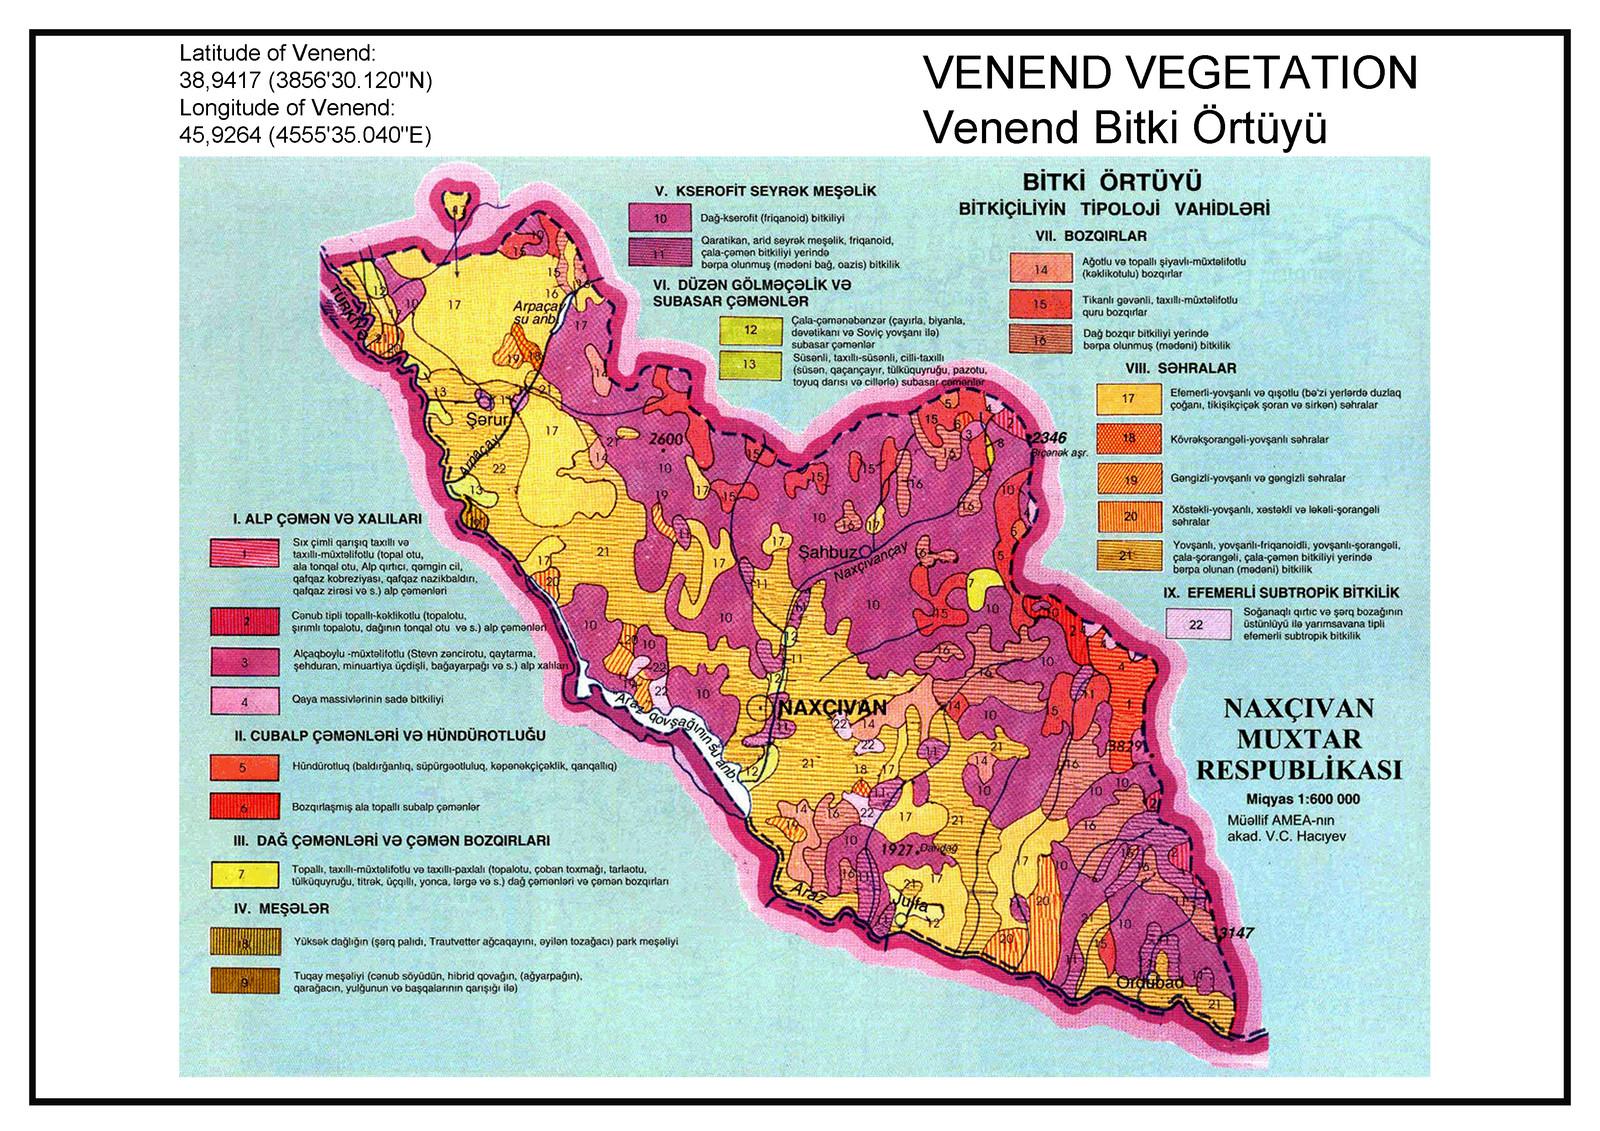 Venend Vegetation Map